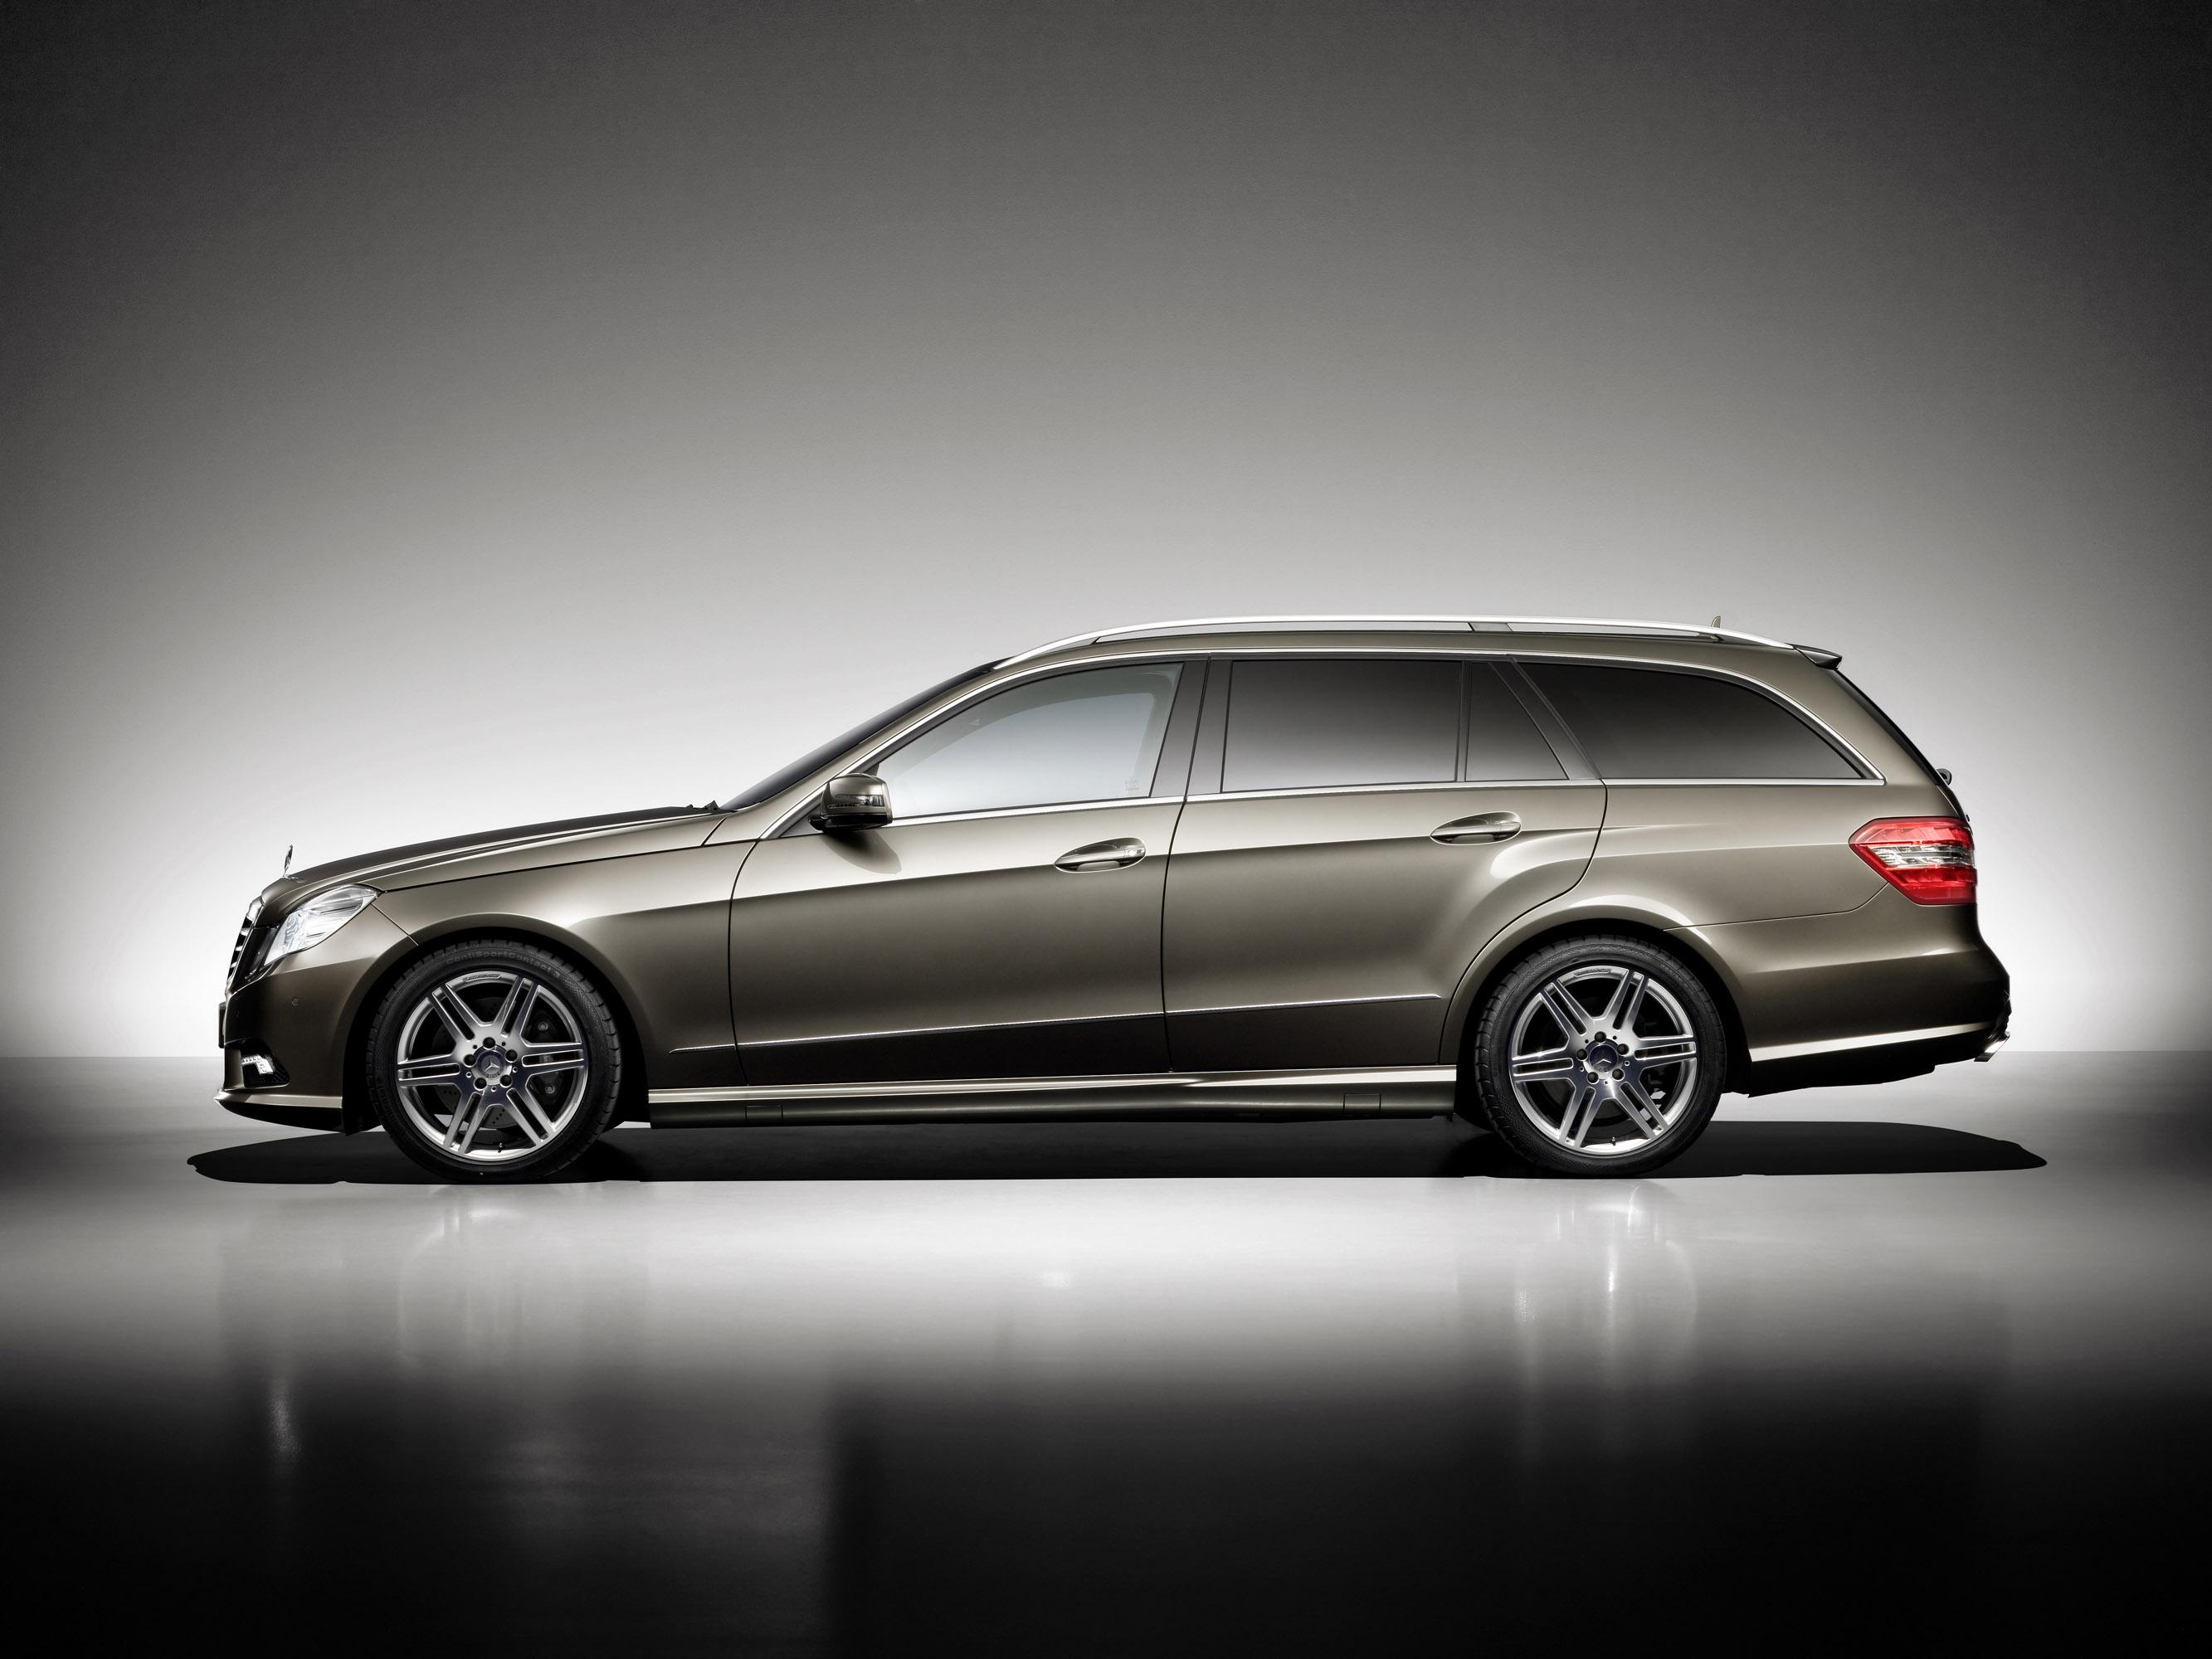 Mercedes-Benz E-Class Универсал - фотография №47